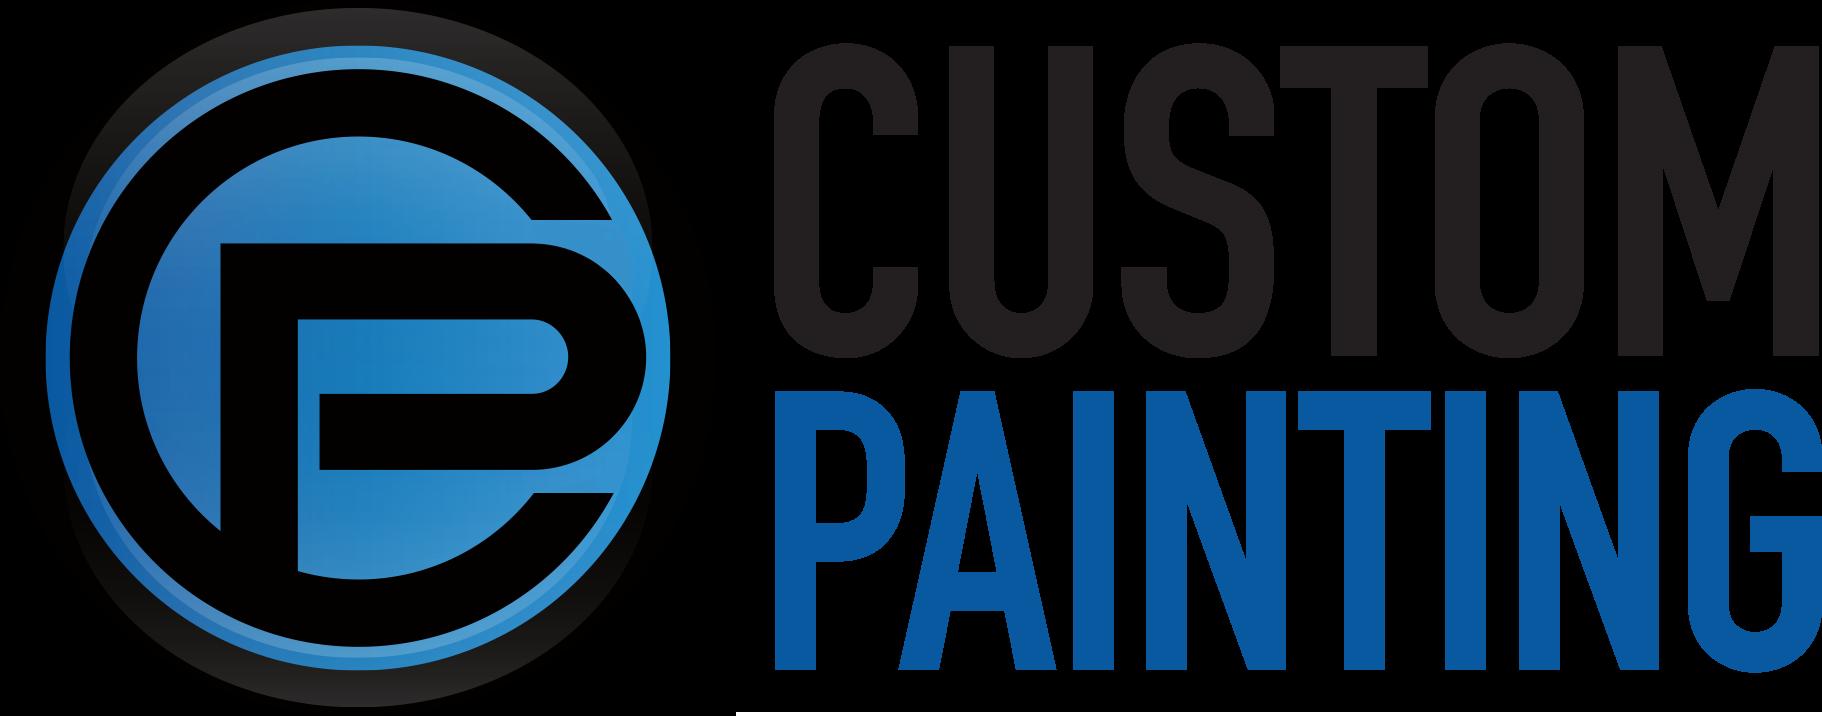 Custom Painting, Inc. logo